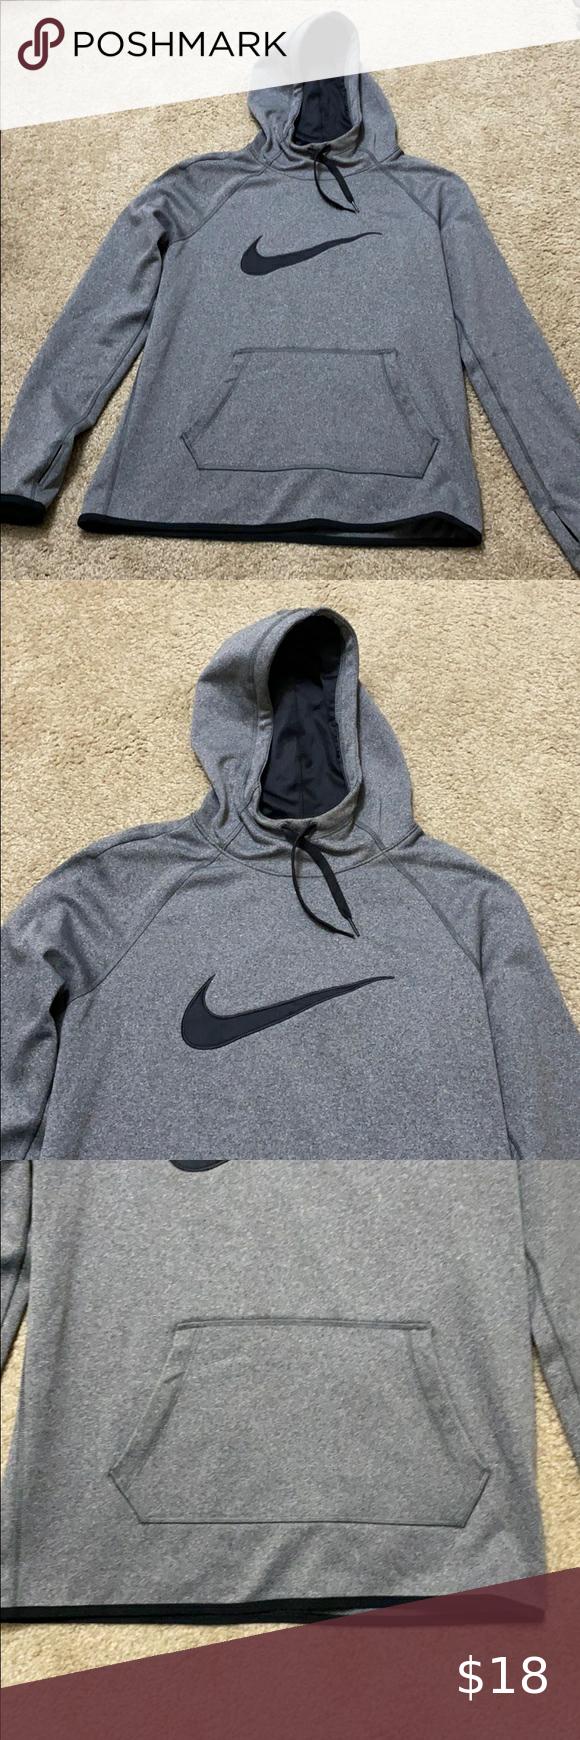 Nike Sweatshirt Child Small Nike Sweatshirts Nike Tech Fleece Hoodie Nike Pullover Hoodie [ 1740 x 580 Pixel ]